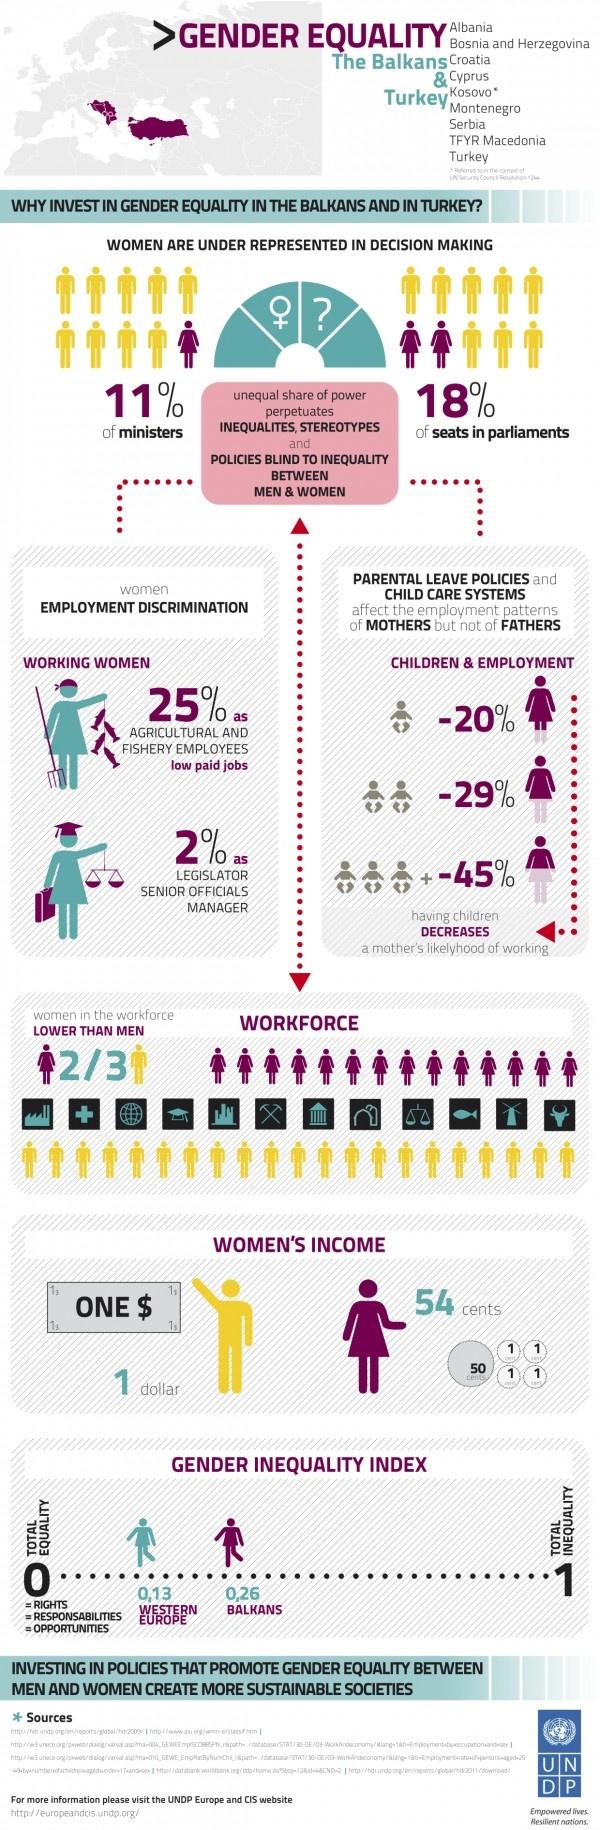 31 best gender equality images on pinterest equality info gender equality the balkans turkey nvjuhfo Image collections